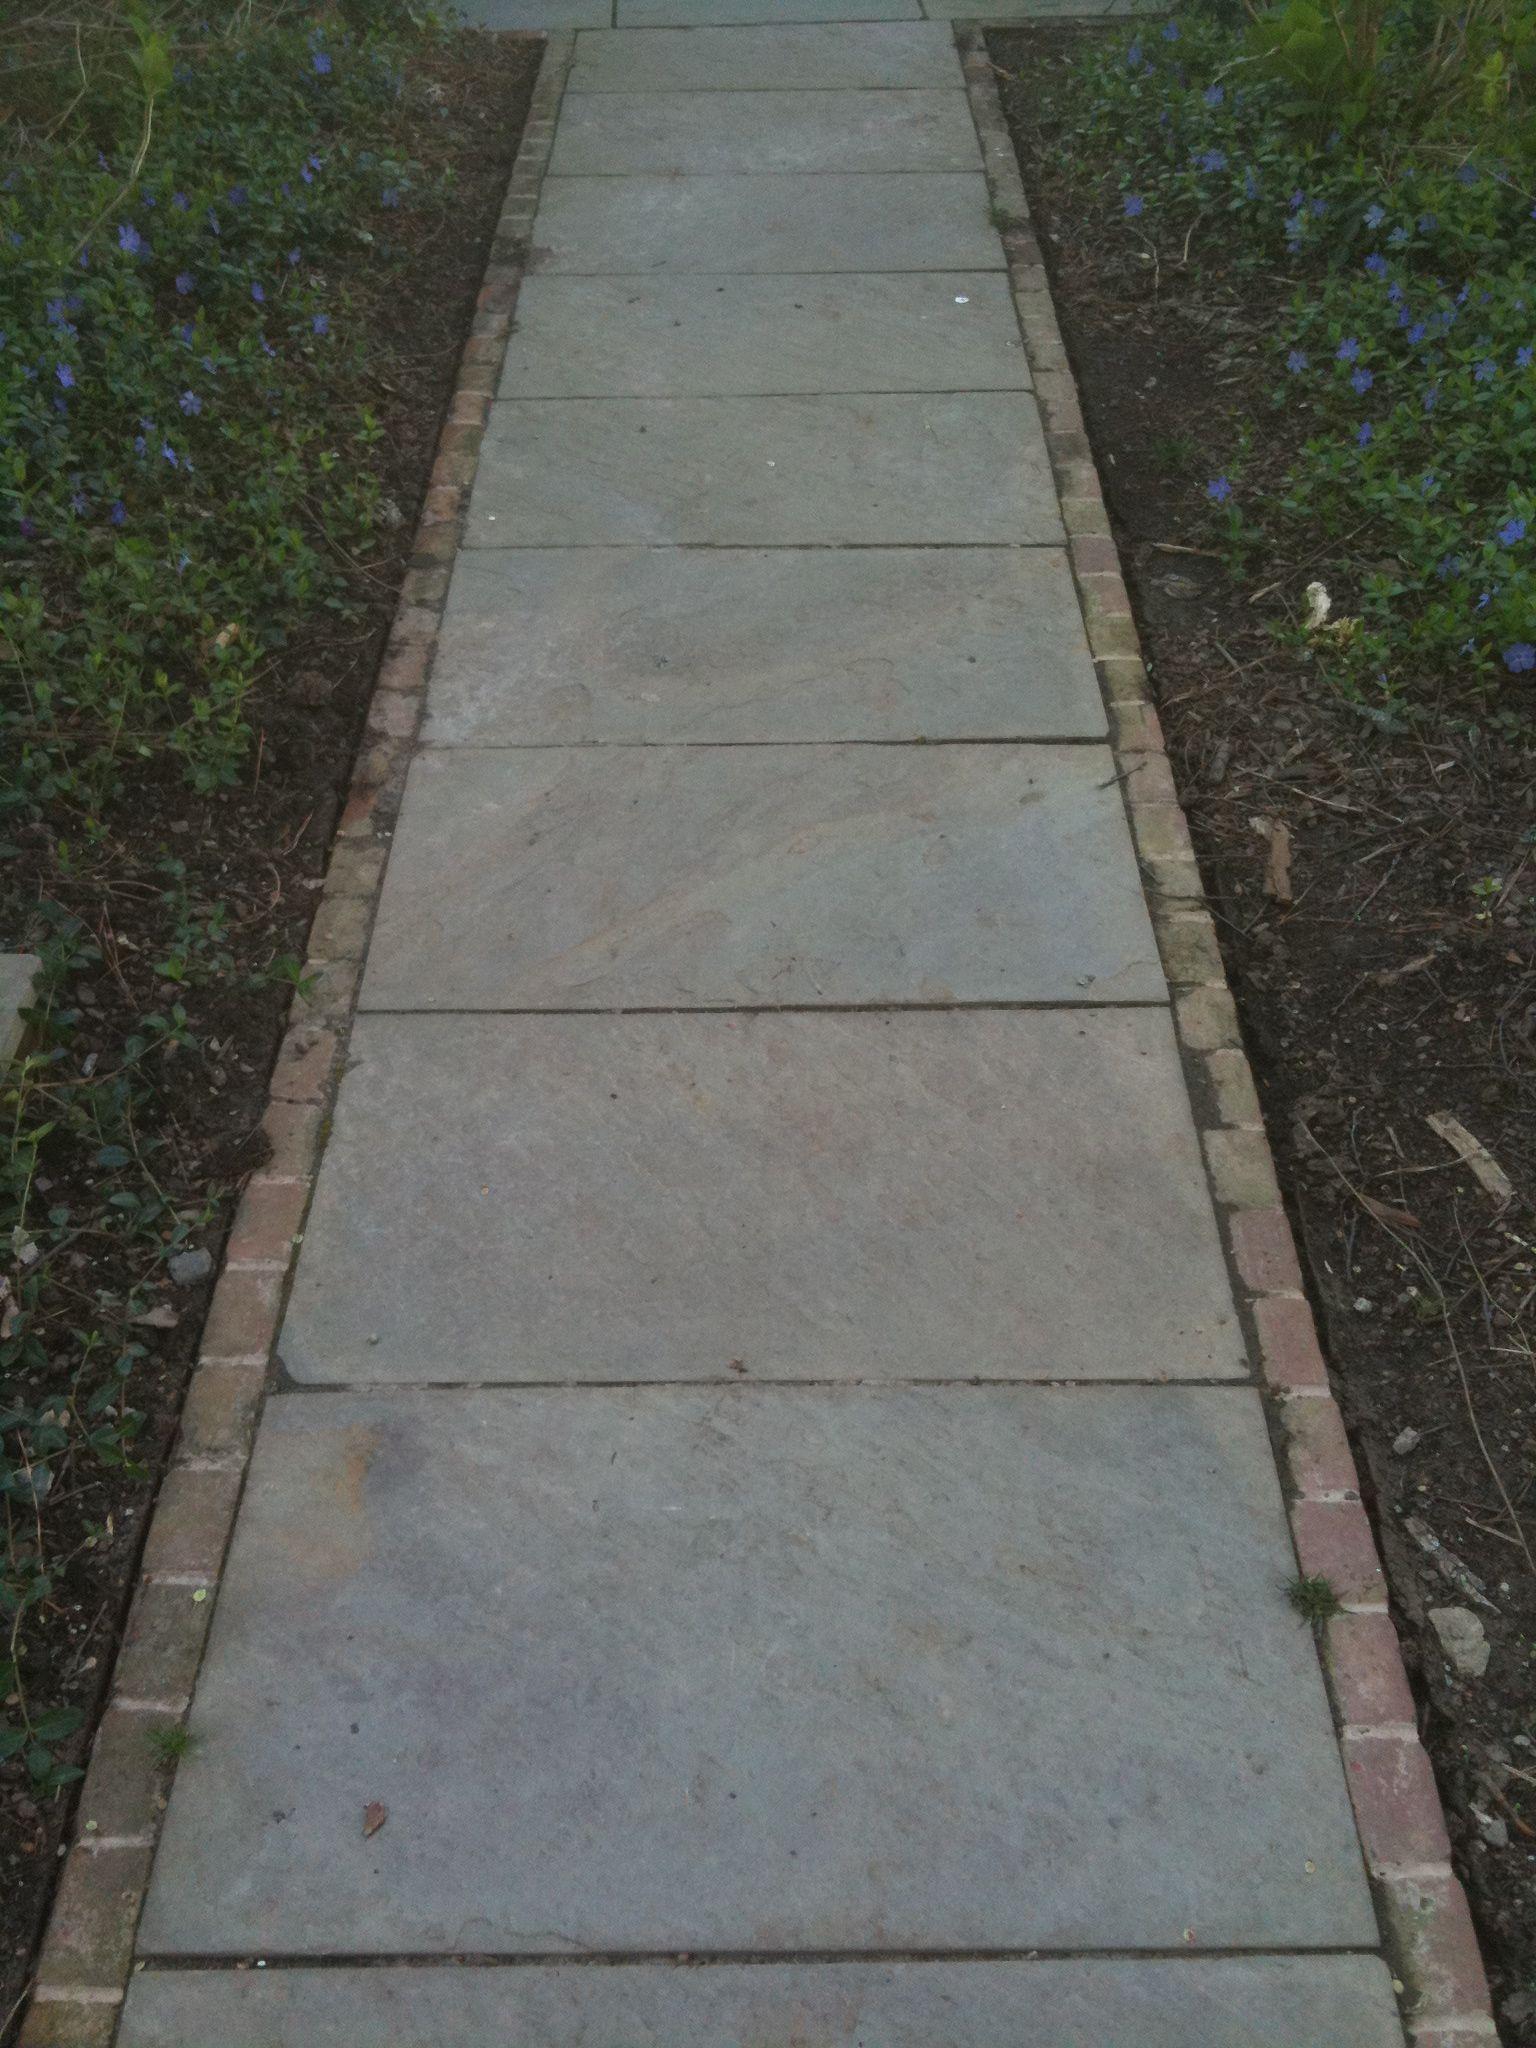 Bluestone With Brick Edge In Sailor Pattern Sidewalk